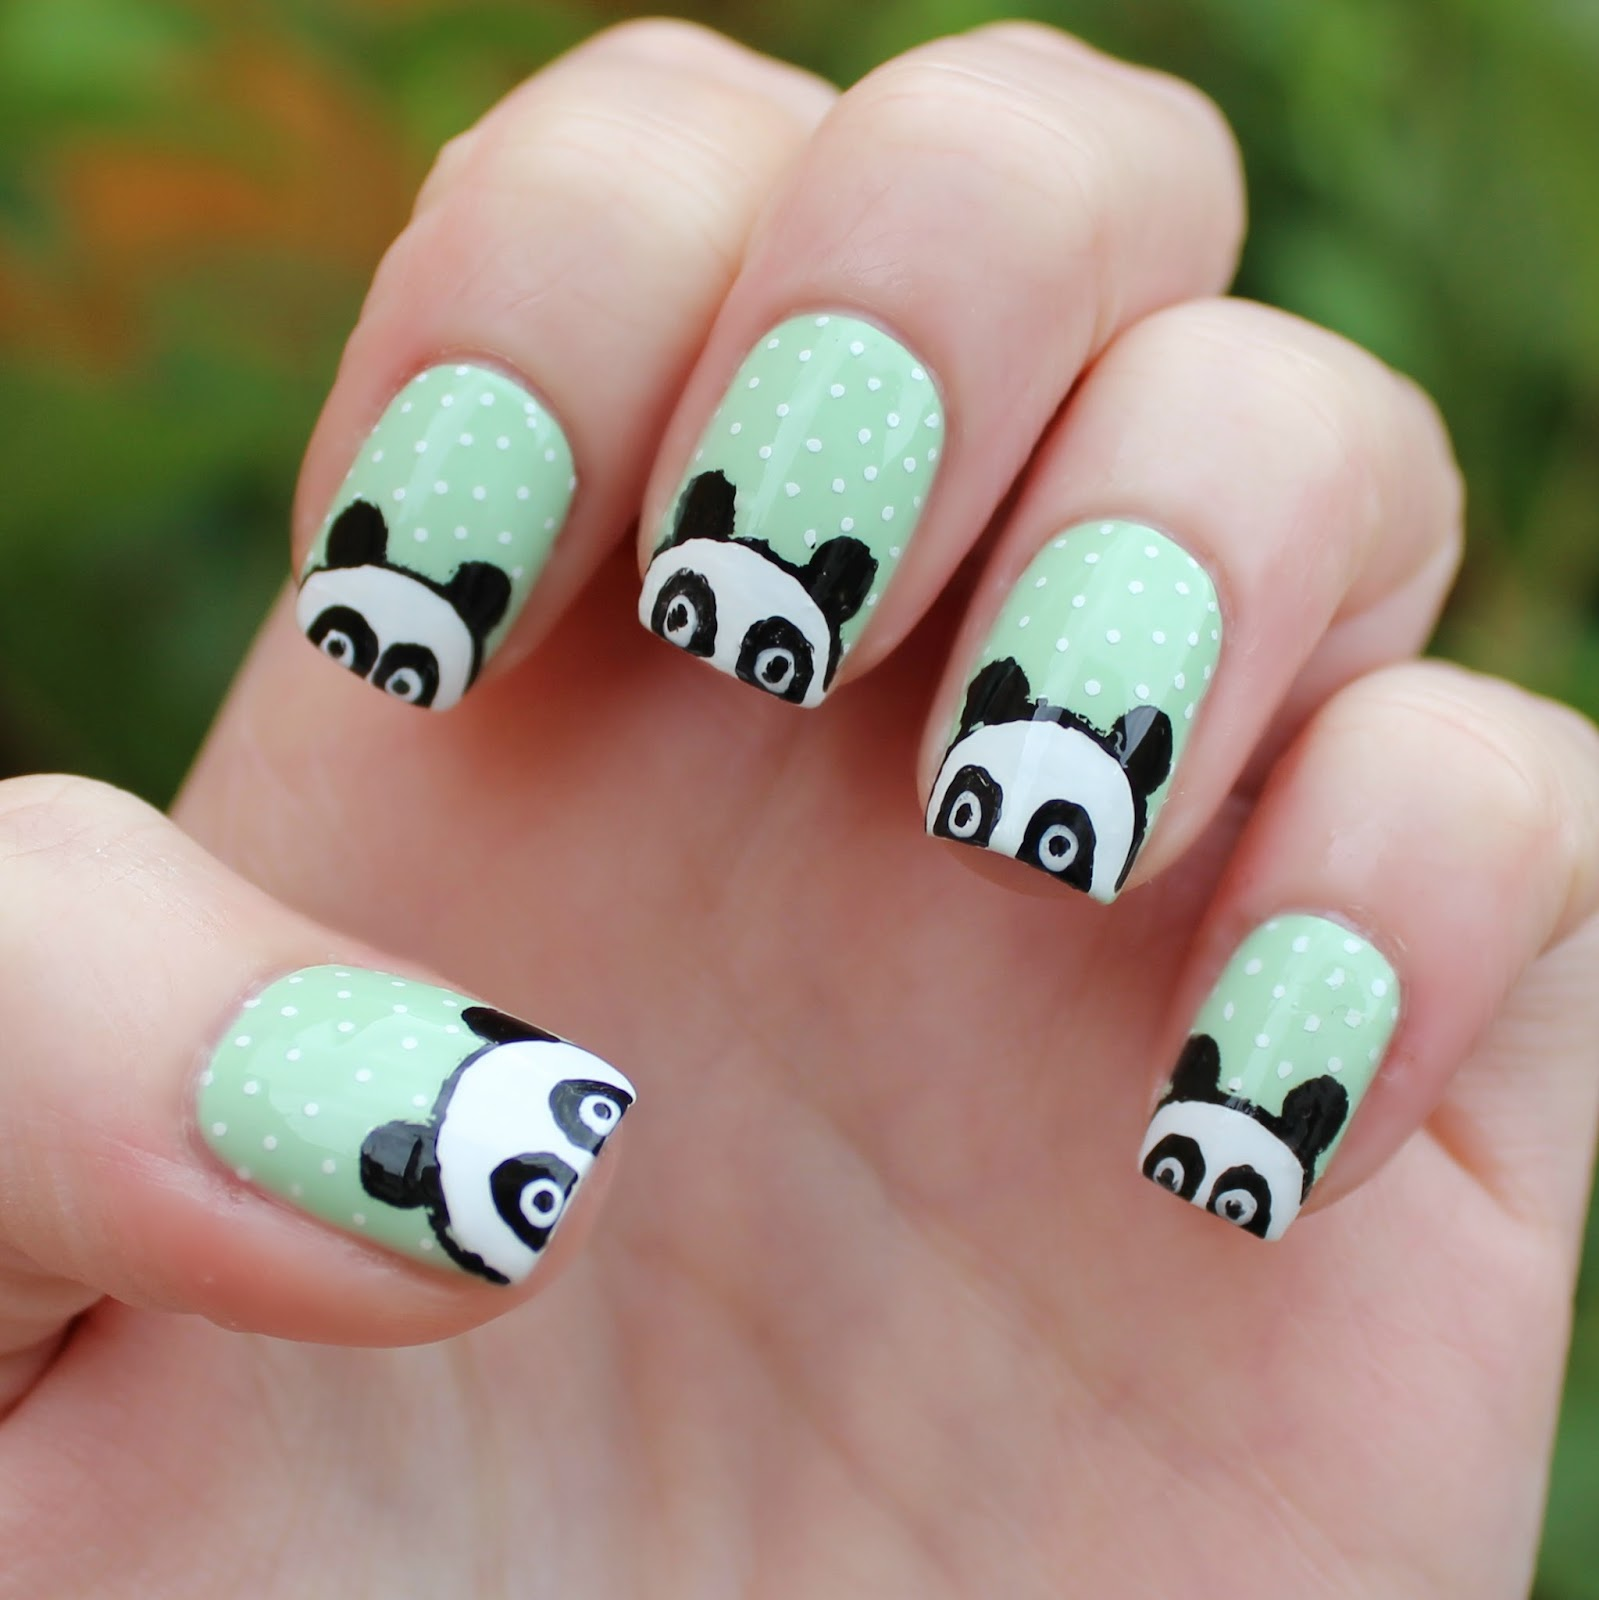 Panda Nail Art: Dahlia Nails: Big Fat Pandas